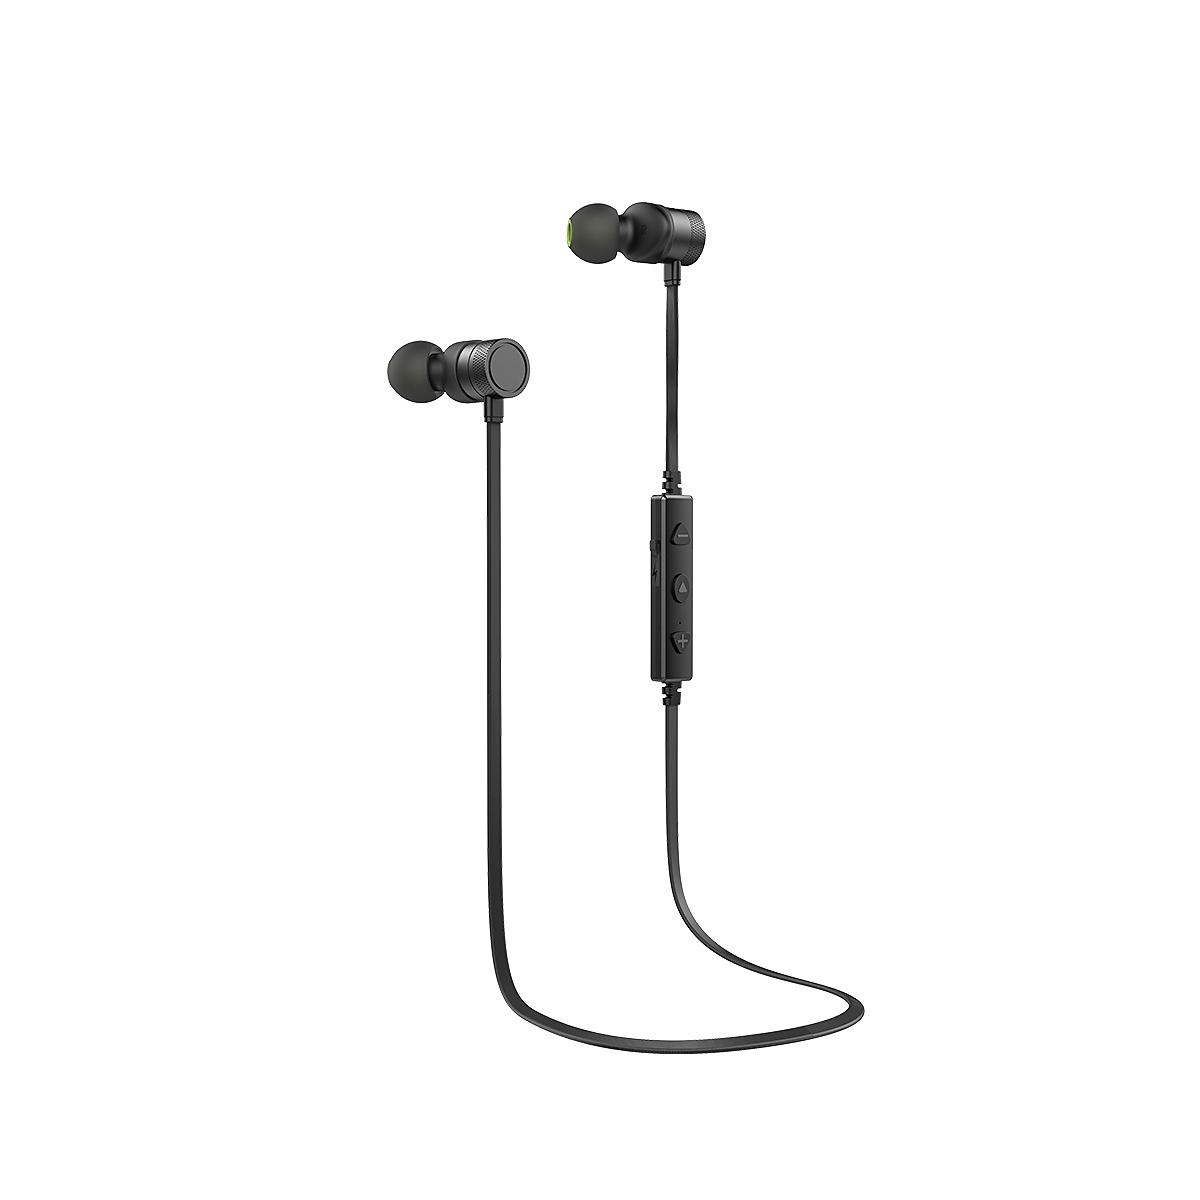 AWEI WT20 Bluetooth 4.2 trådlösa in-ear hörlurar